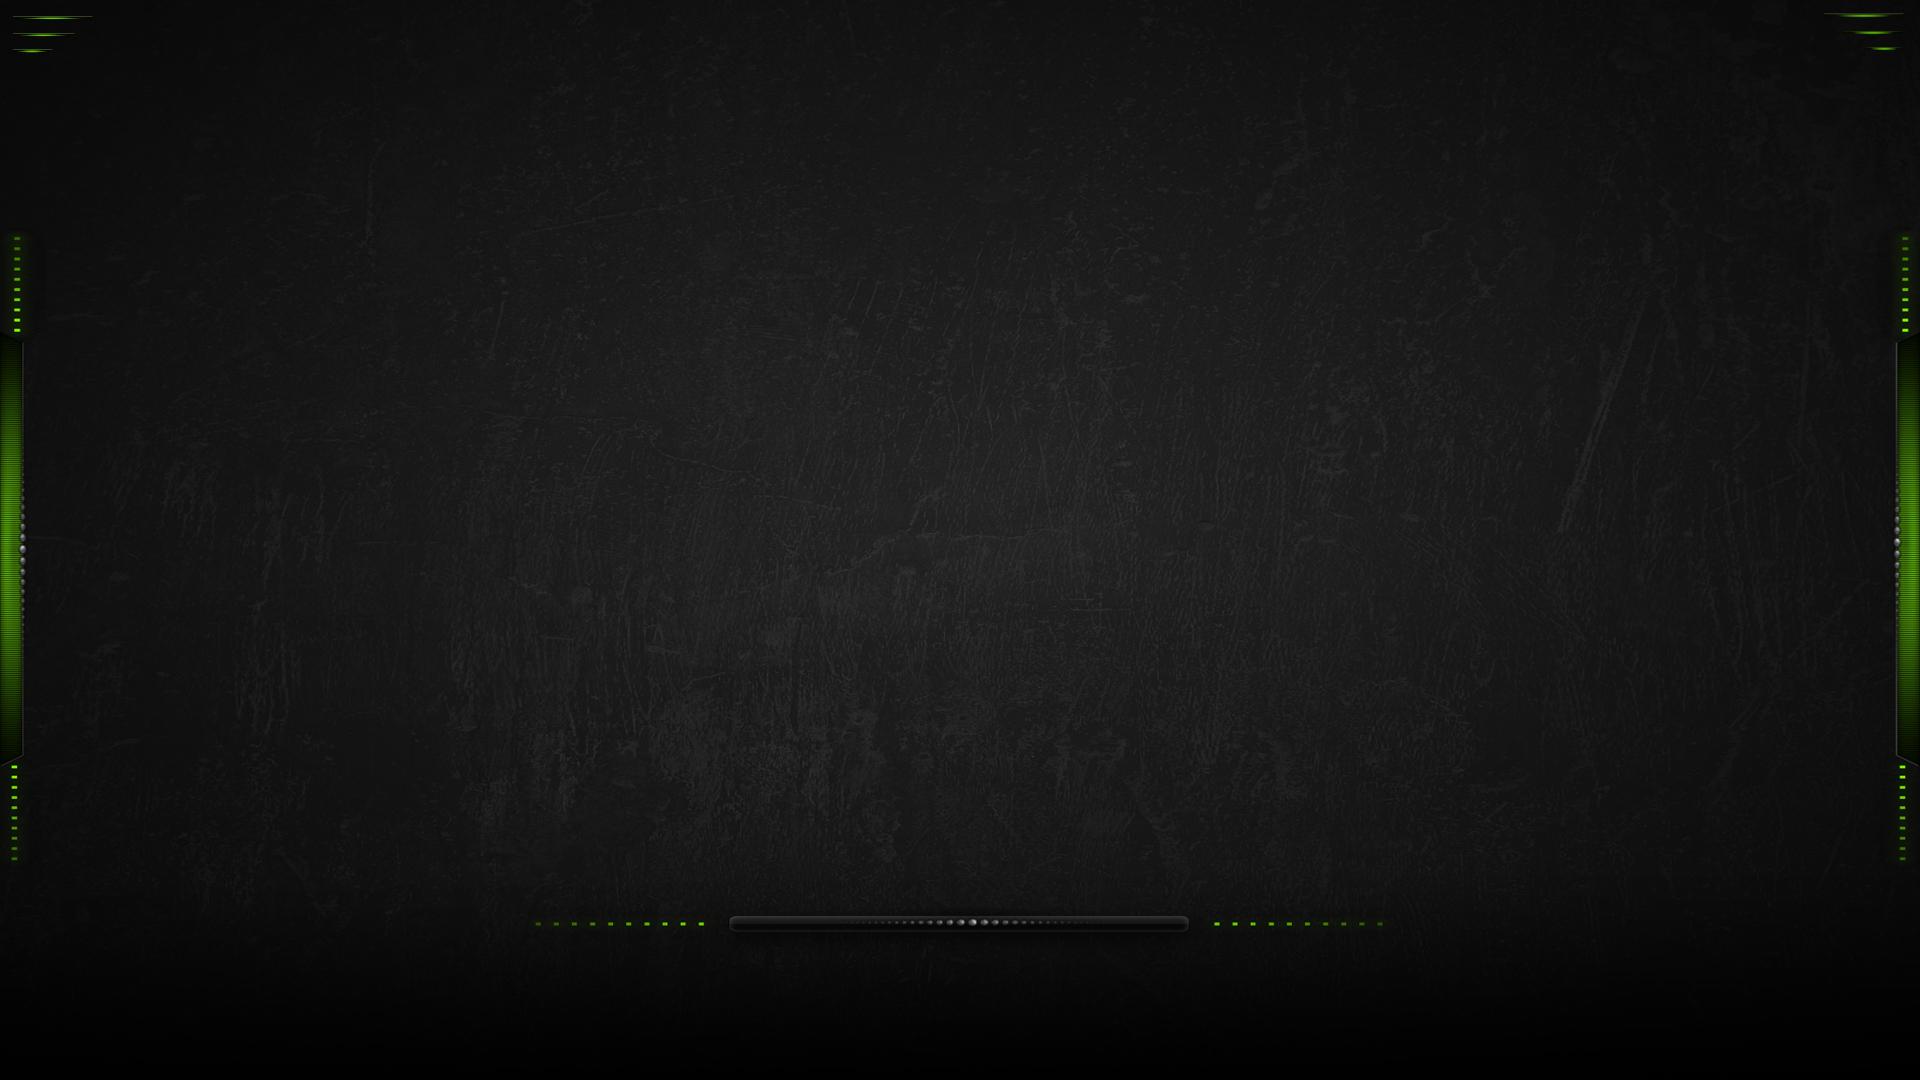 HQ Plain Wallpaper Full HD Pictures 1920x1080